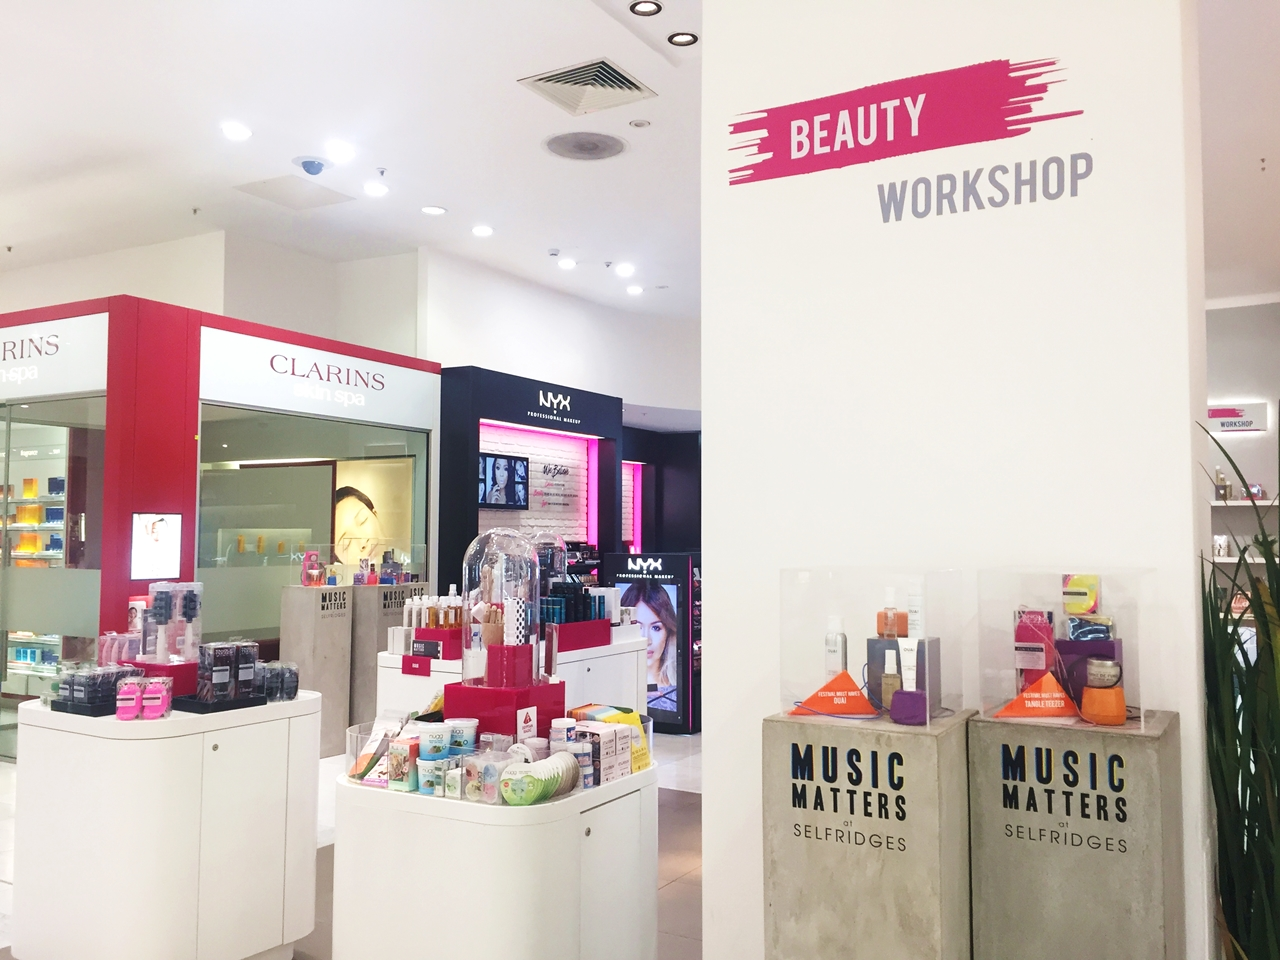 Selfridges Beauty Workshop opens at Trafford Centre